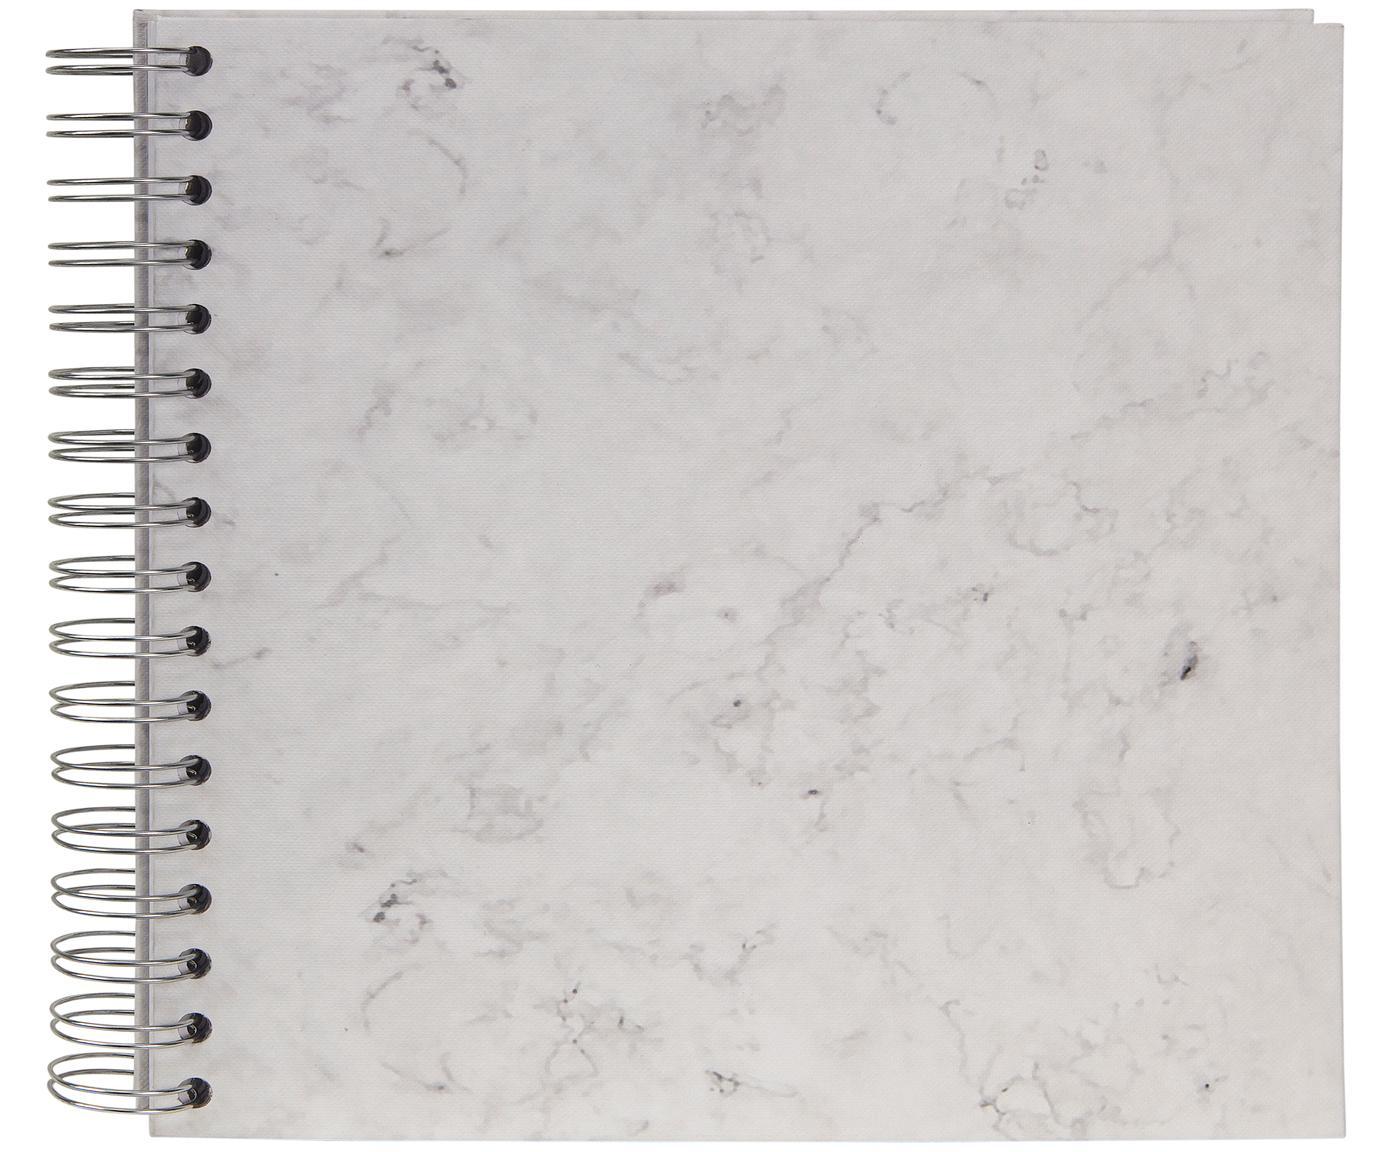 Albúm de fotos Picture, Blanco, veteado, An 25 x Al 22 cm